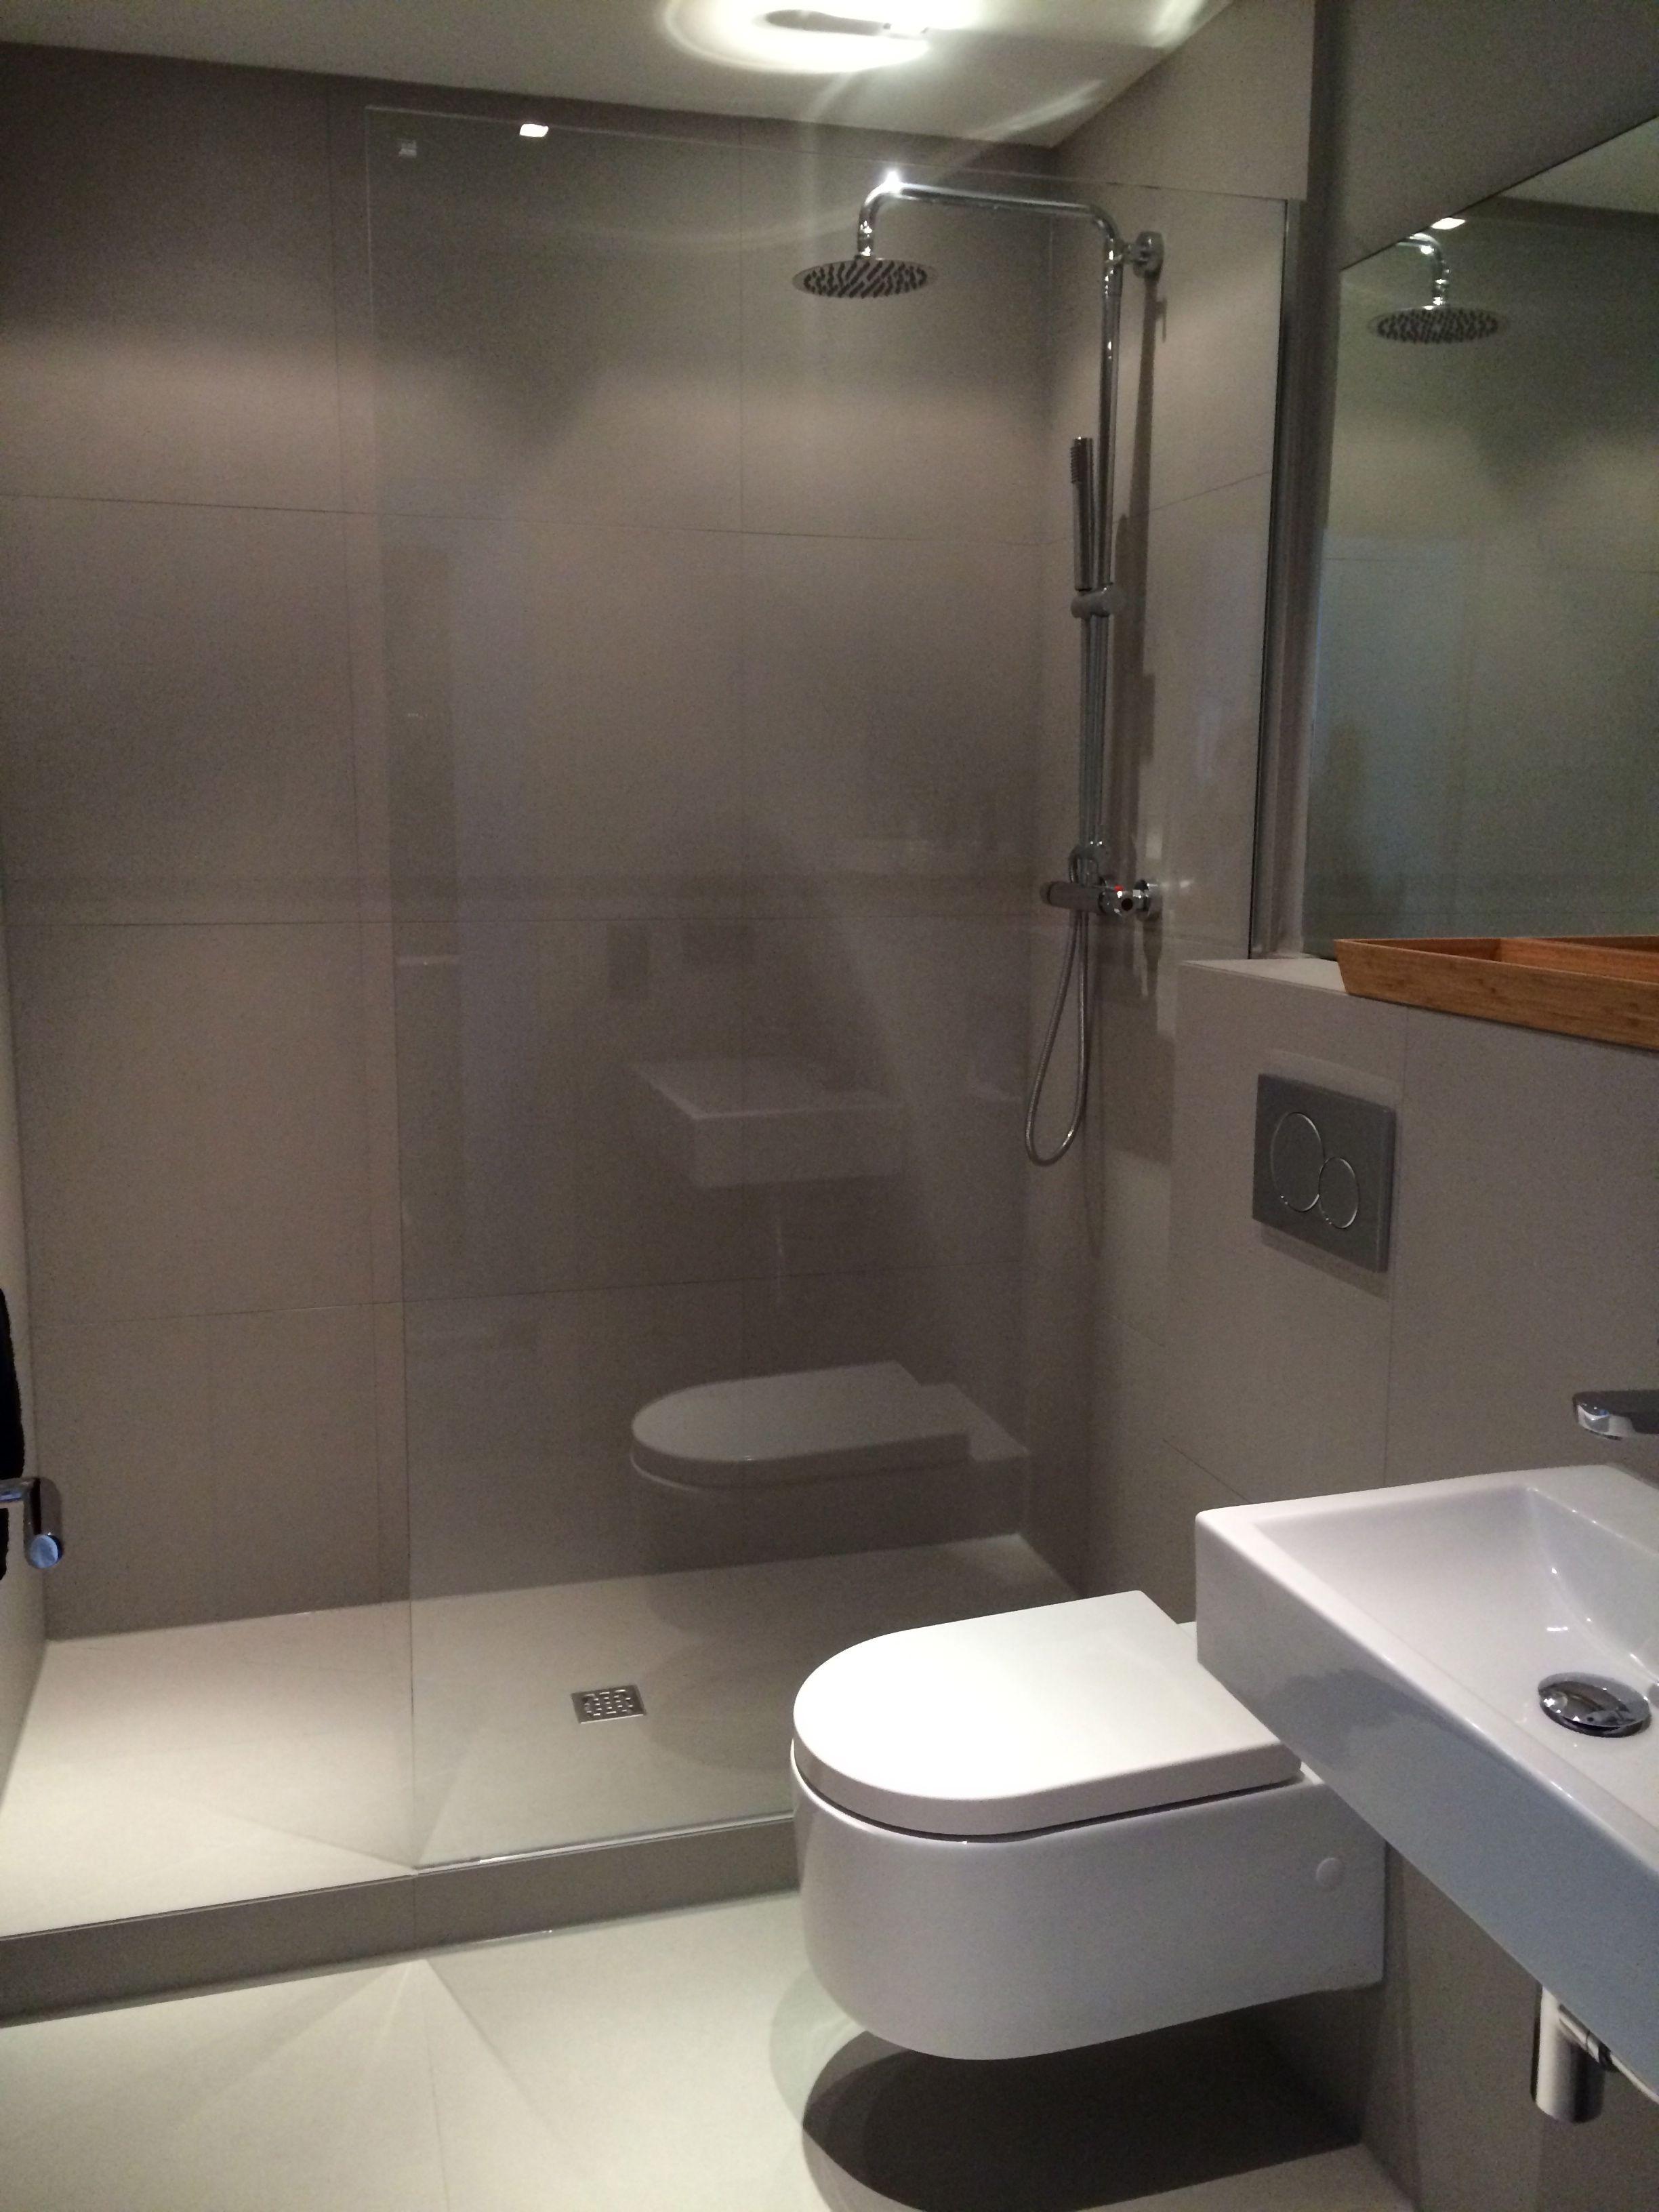 Ensuite badezimmerdesign sandsteinubad  en suite  pinterest